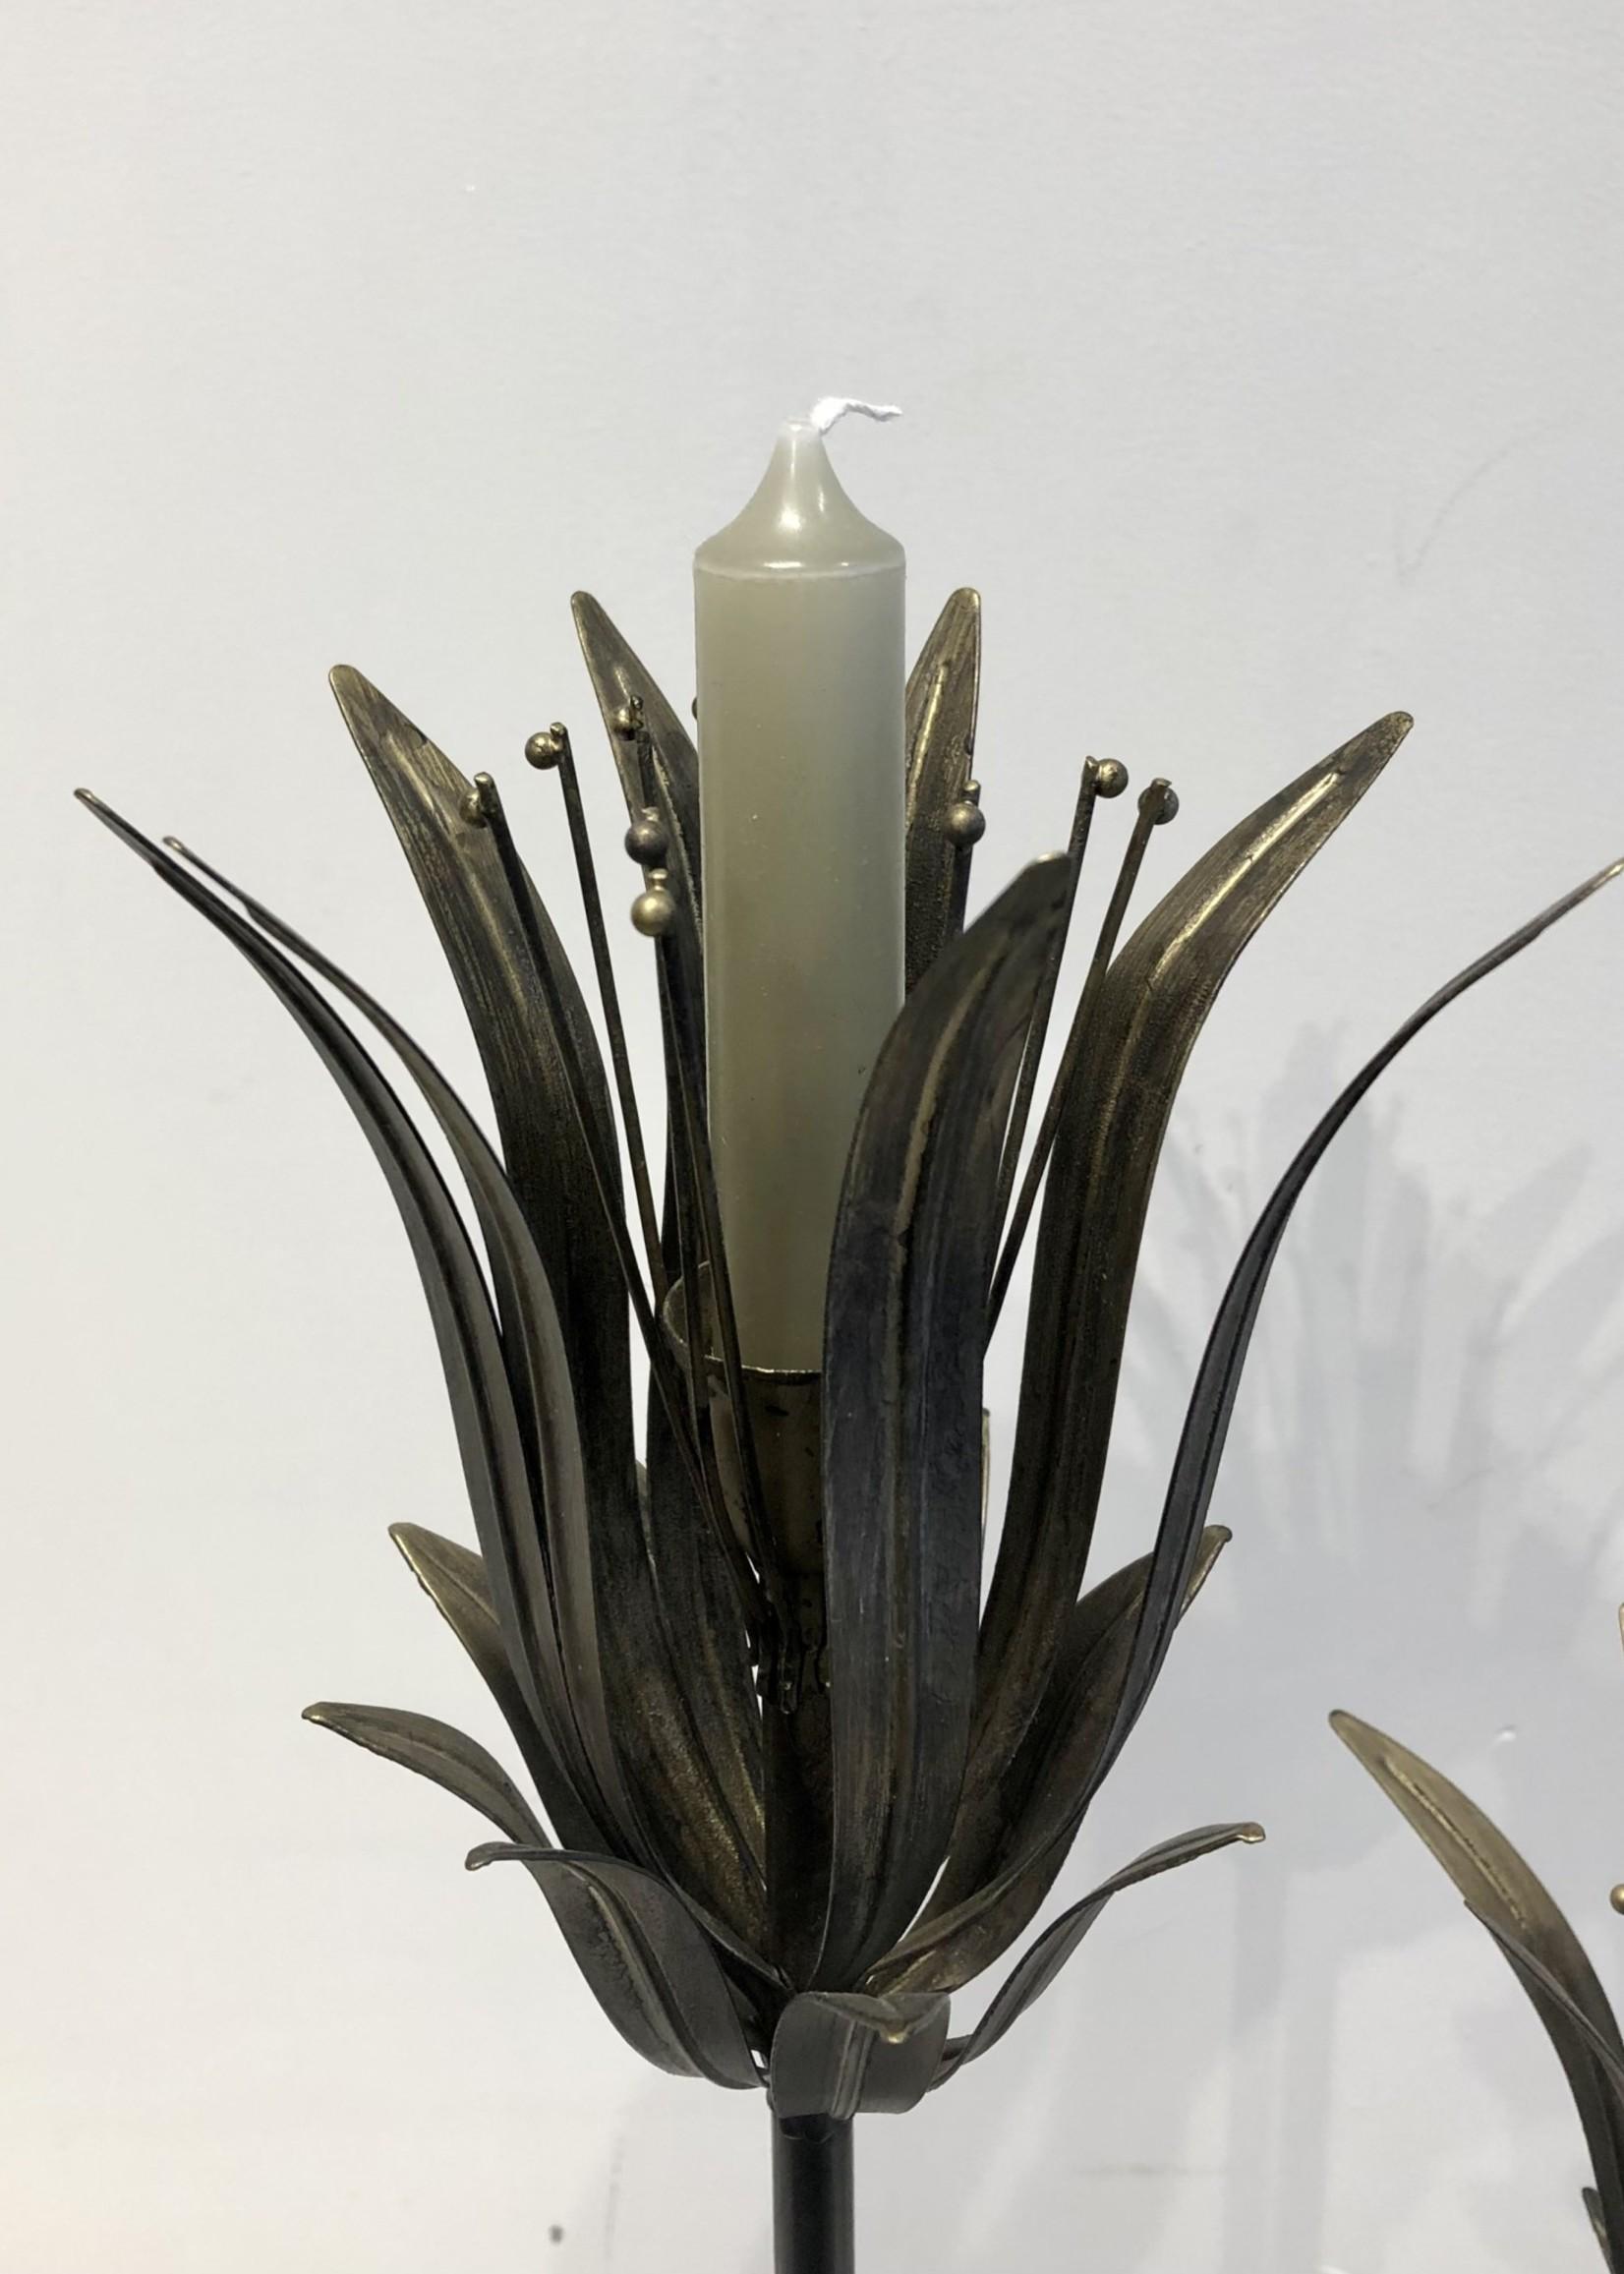 Rustik Lys Pakje van 6 kaarsjes 2x12 cm Eucalyptus